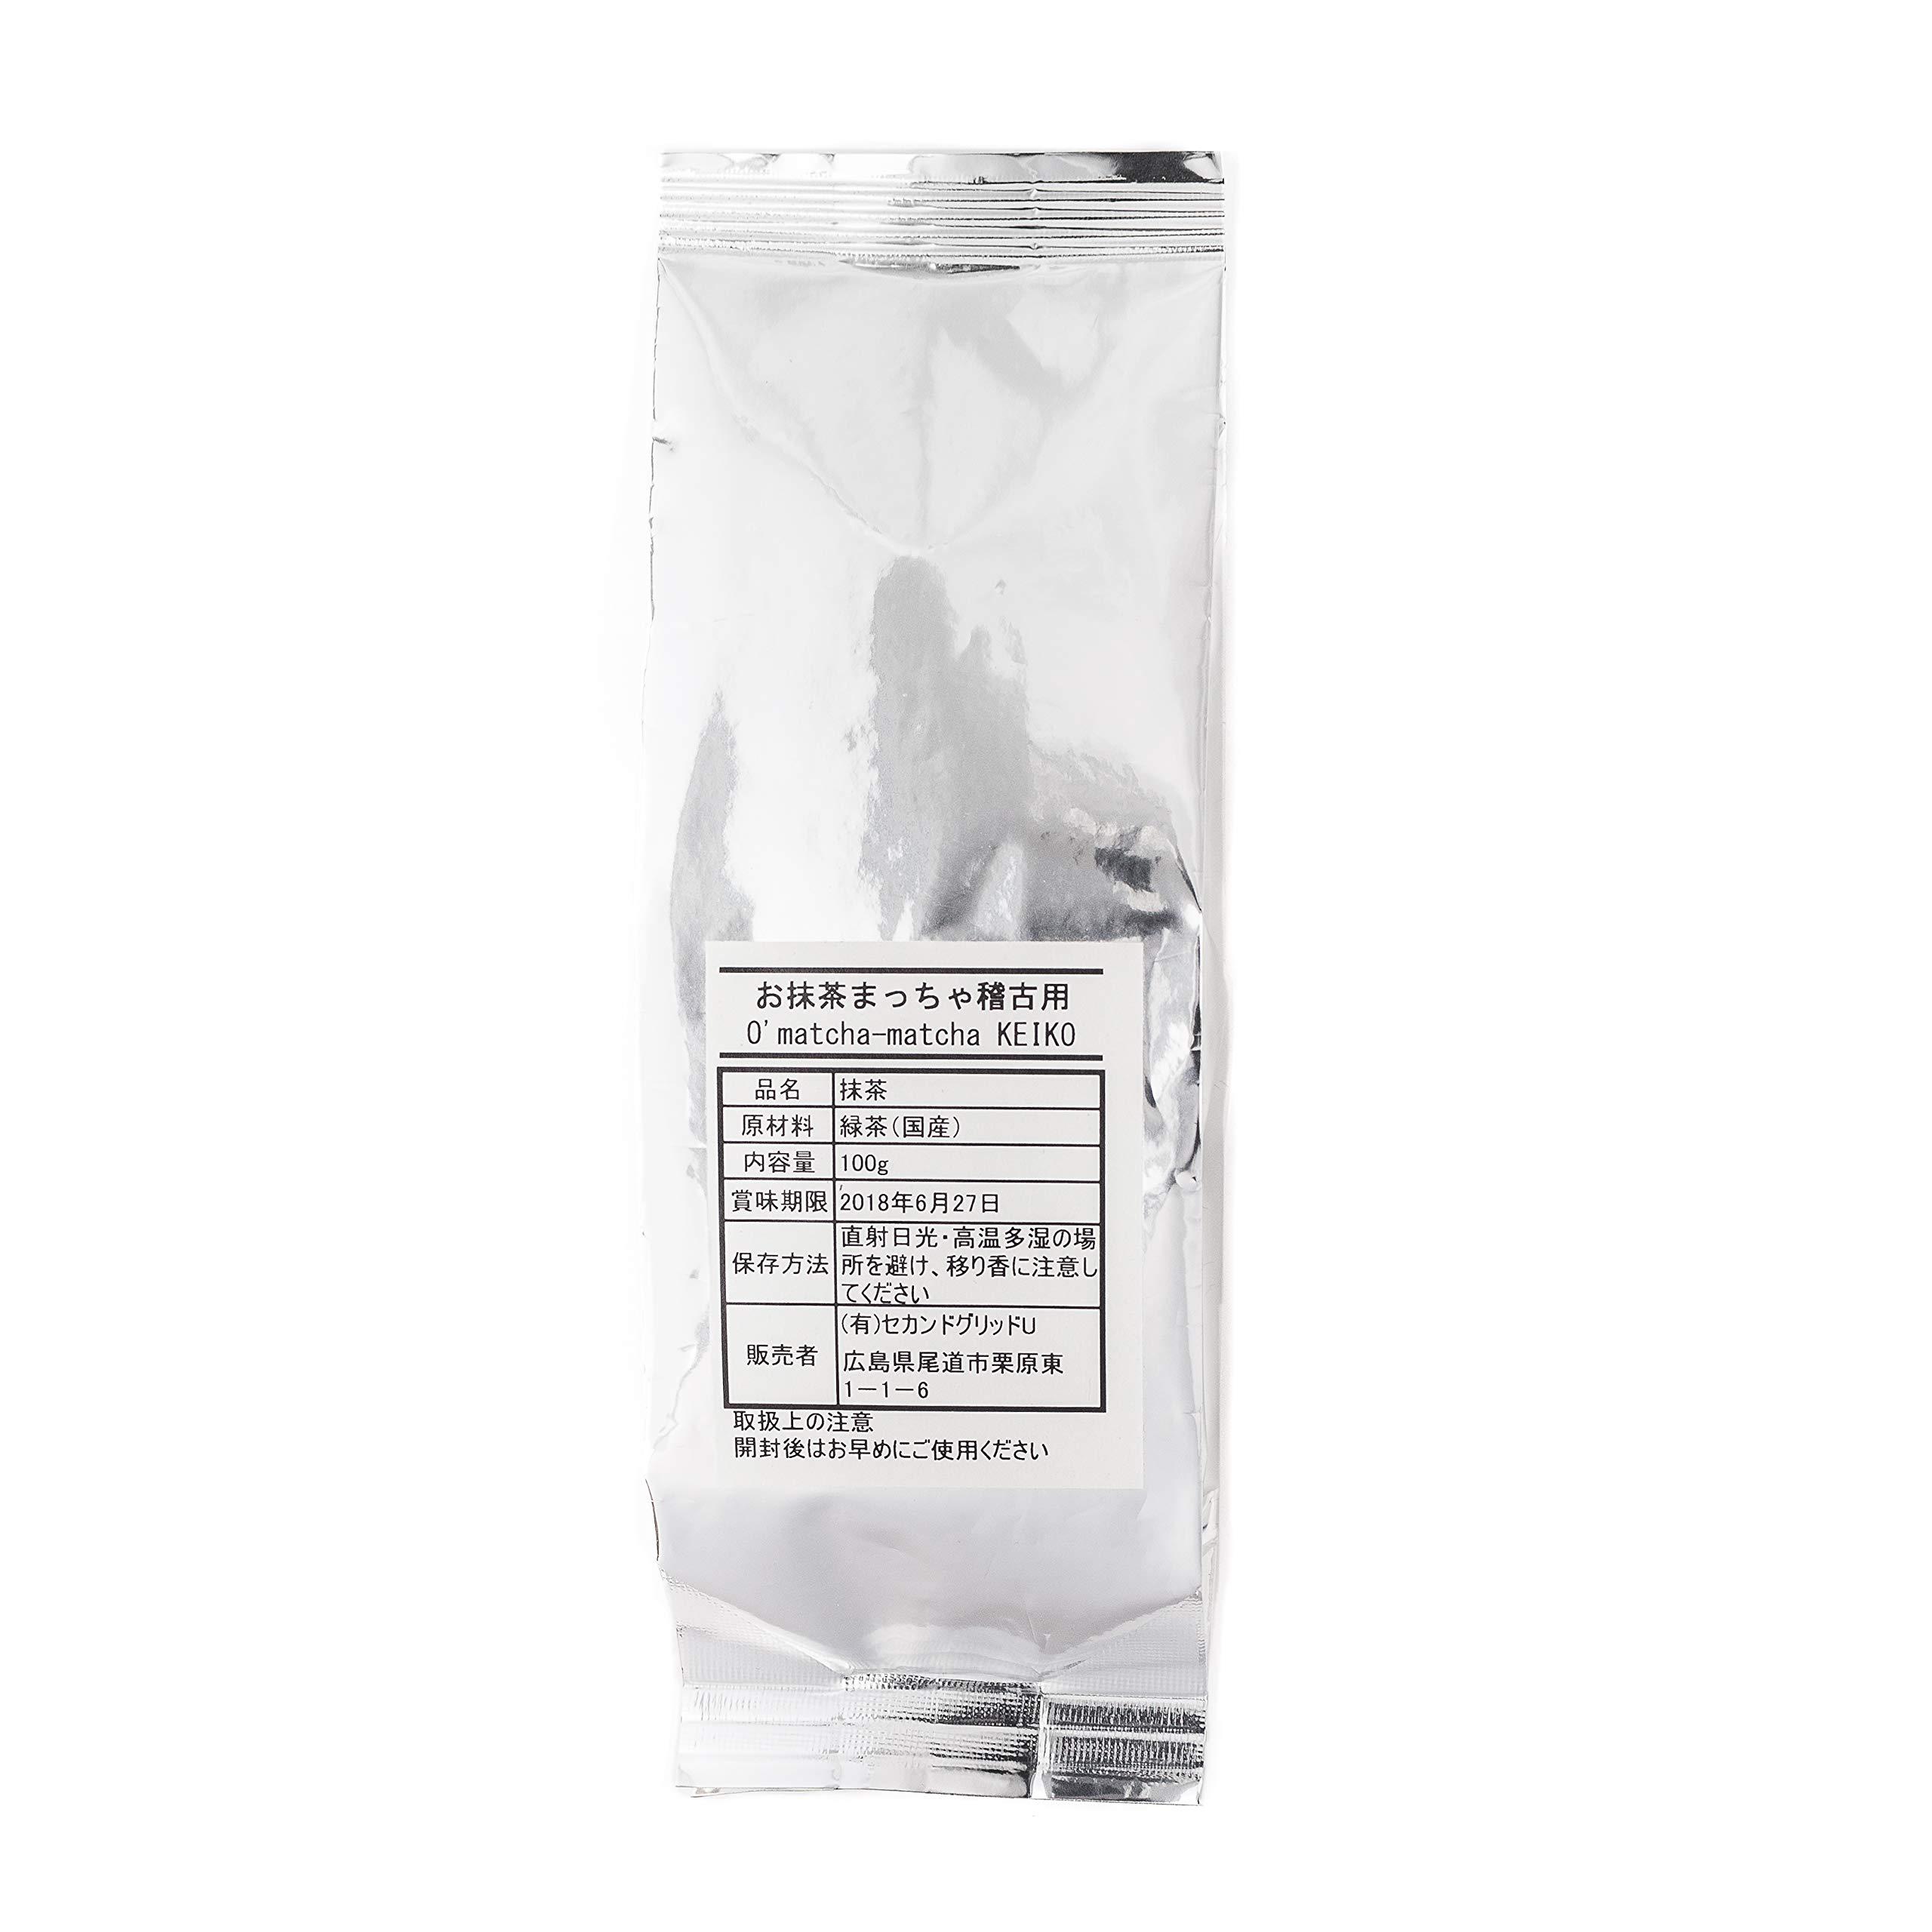 Nippon Cha - Keiko Matcha - Japanese Origin - Culinary Grade Matcha - Healthy Coffee Alternative - Energy, 100g/bag